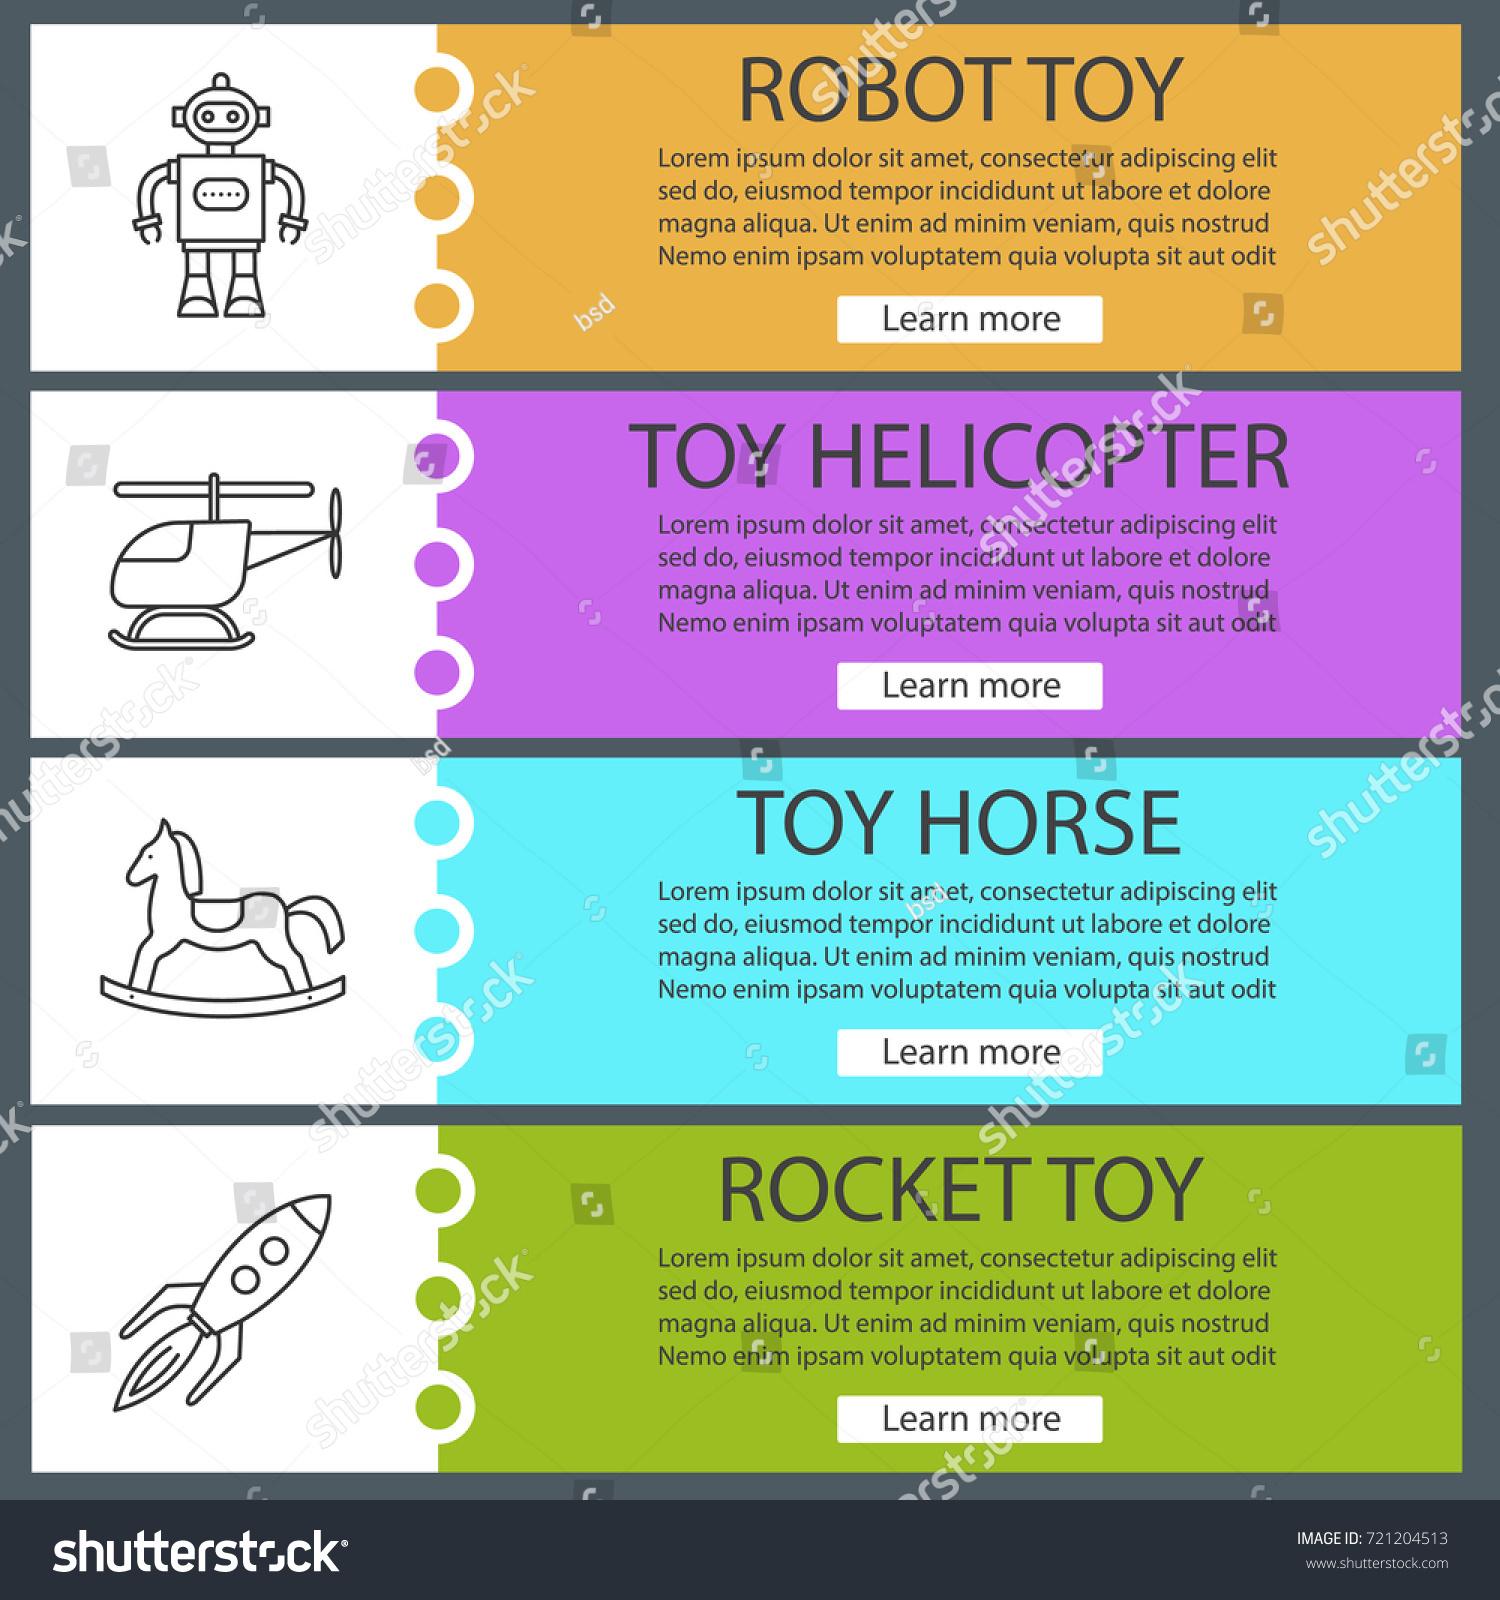 6 Salon Menu Template Procedure Sample Check Voucher Stock Vector Kids Toys  Web Banner Templates Set